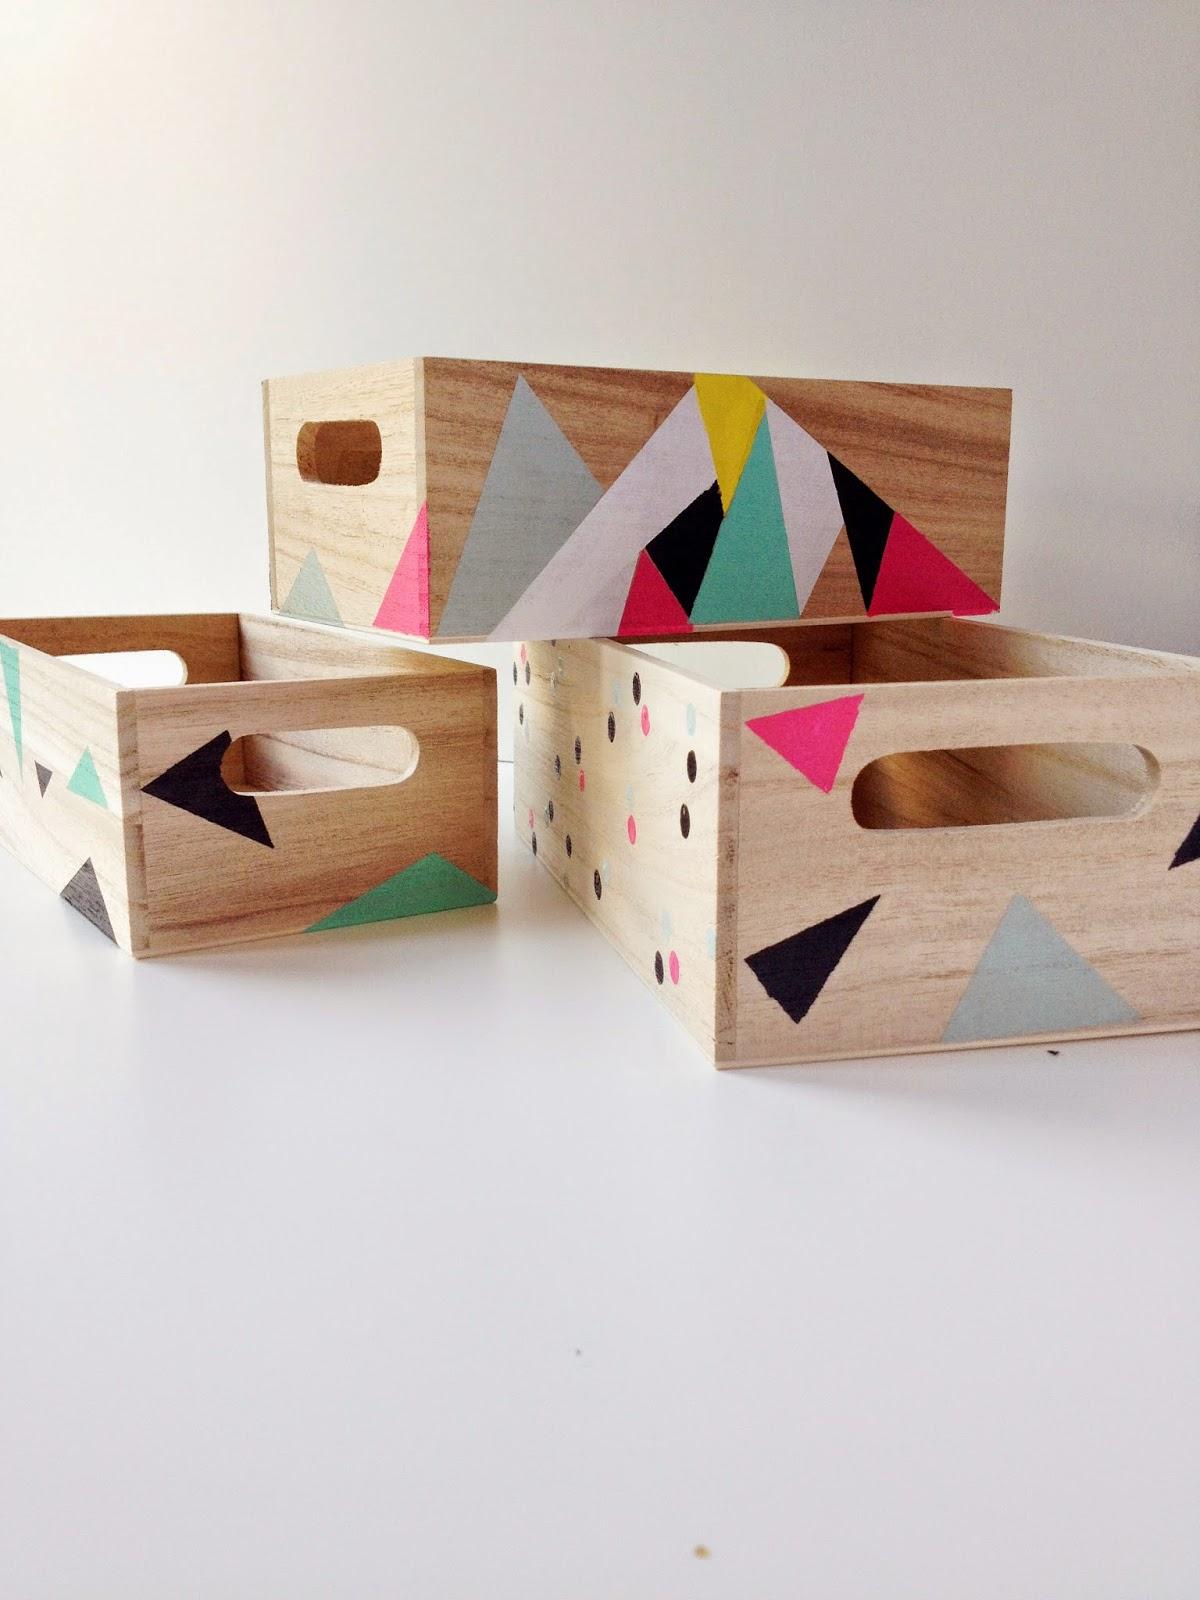 Como decorar una caja de madera tutorial facil paso a paso - Madera para decorar ...